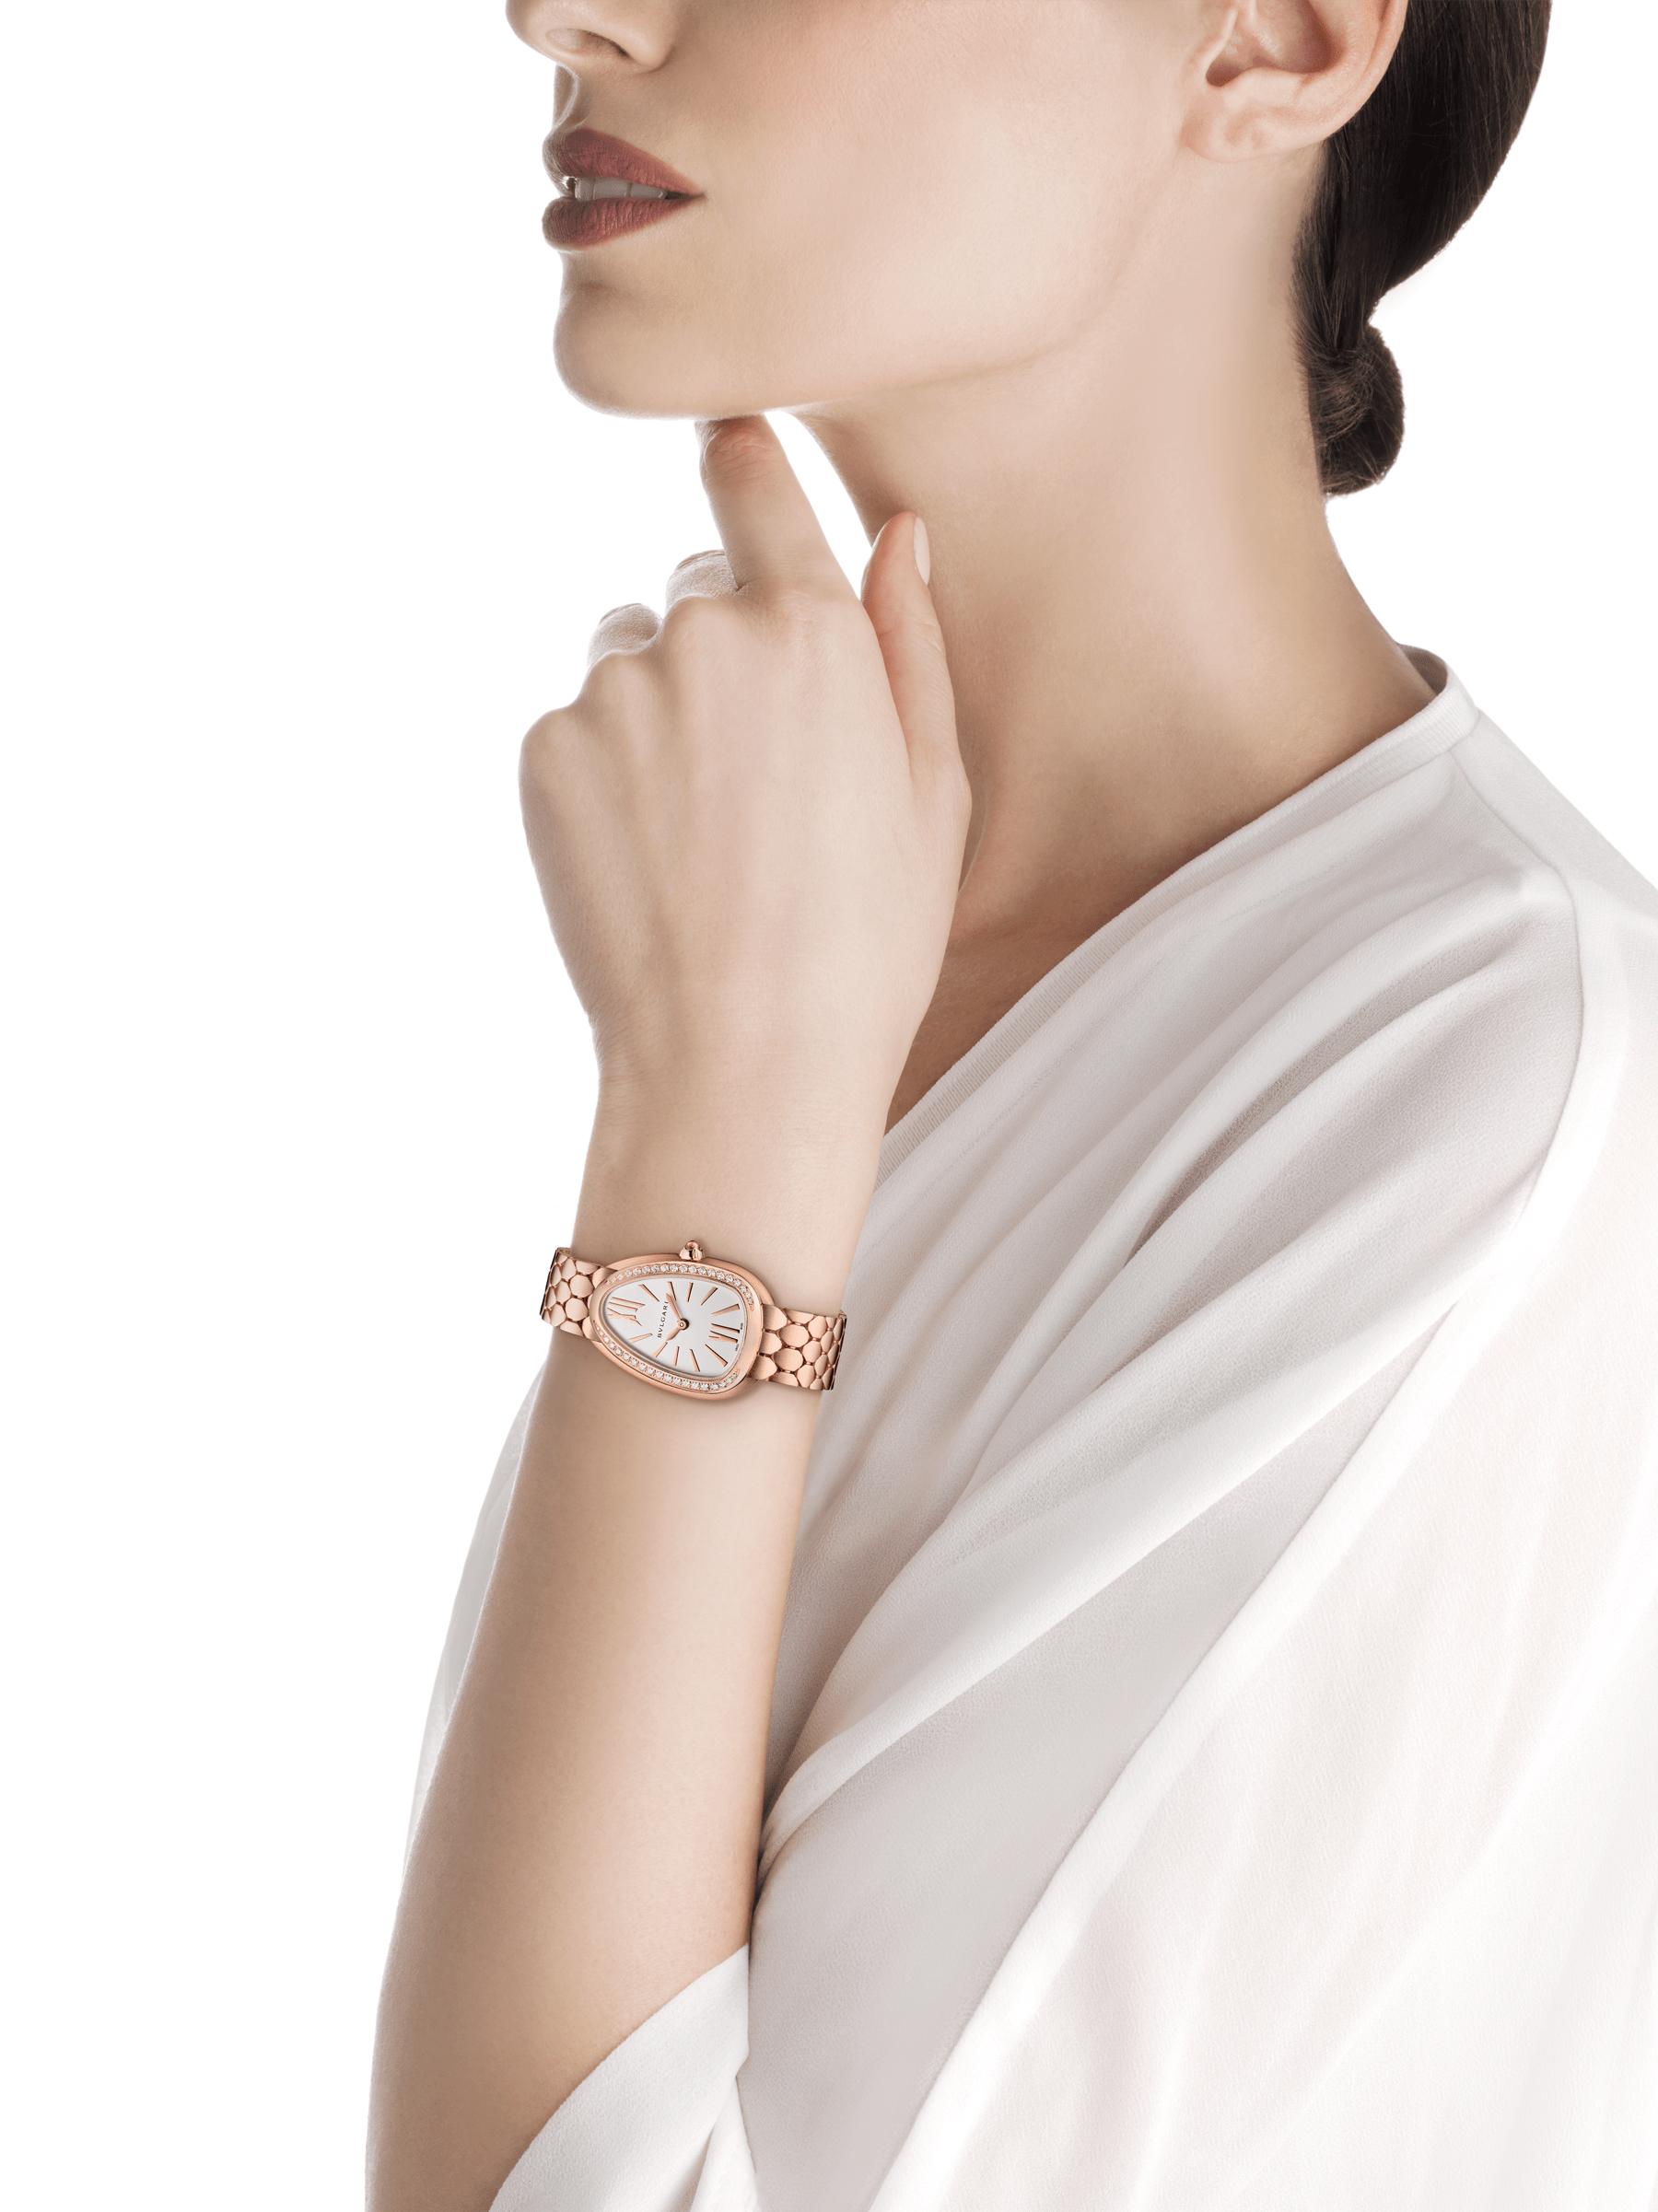 Serpenti Seduttori 腕錶,18K 玫瑰金錶殼和錶圈鑲飾鑽石,銀白色蛋白石錶盤,18K 玫瑰金髮絲紋錶帶。 103169 image 4